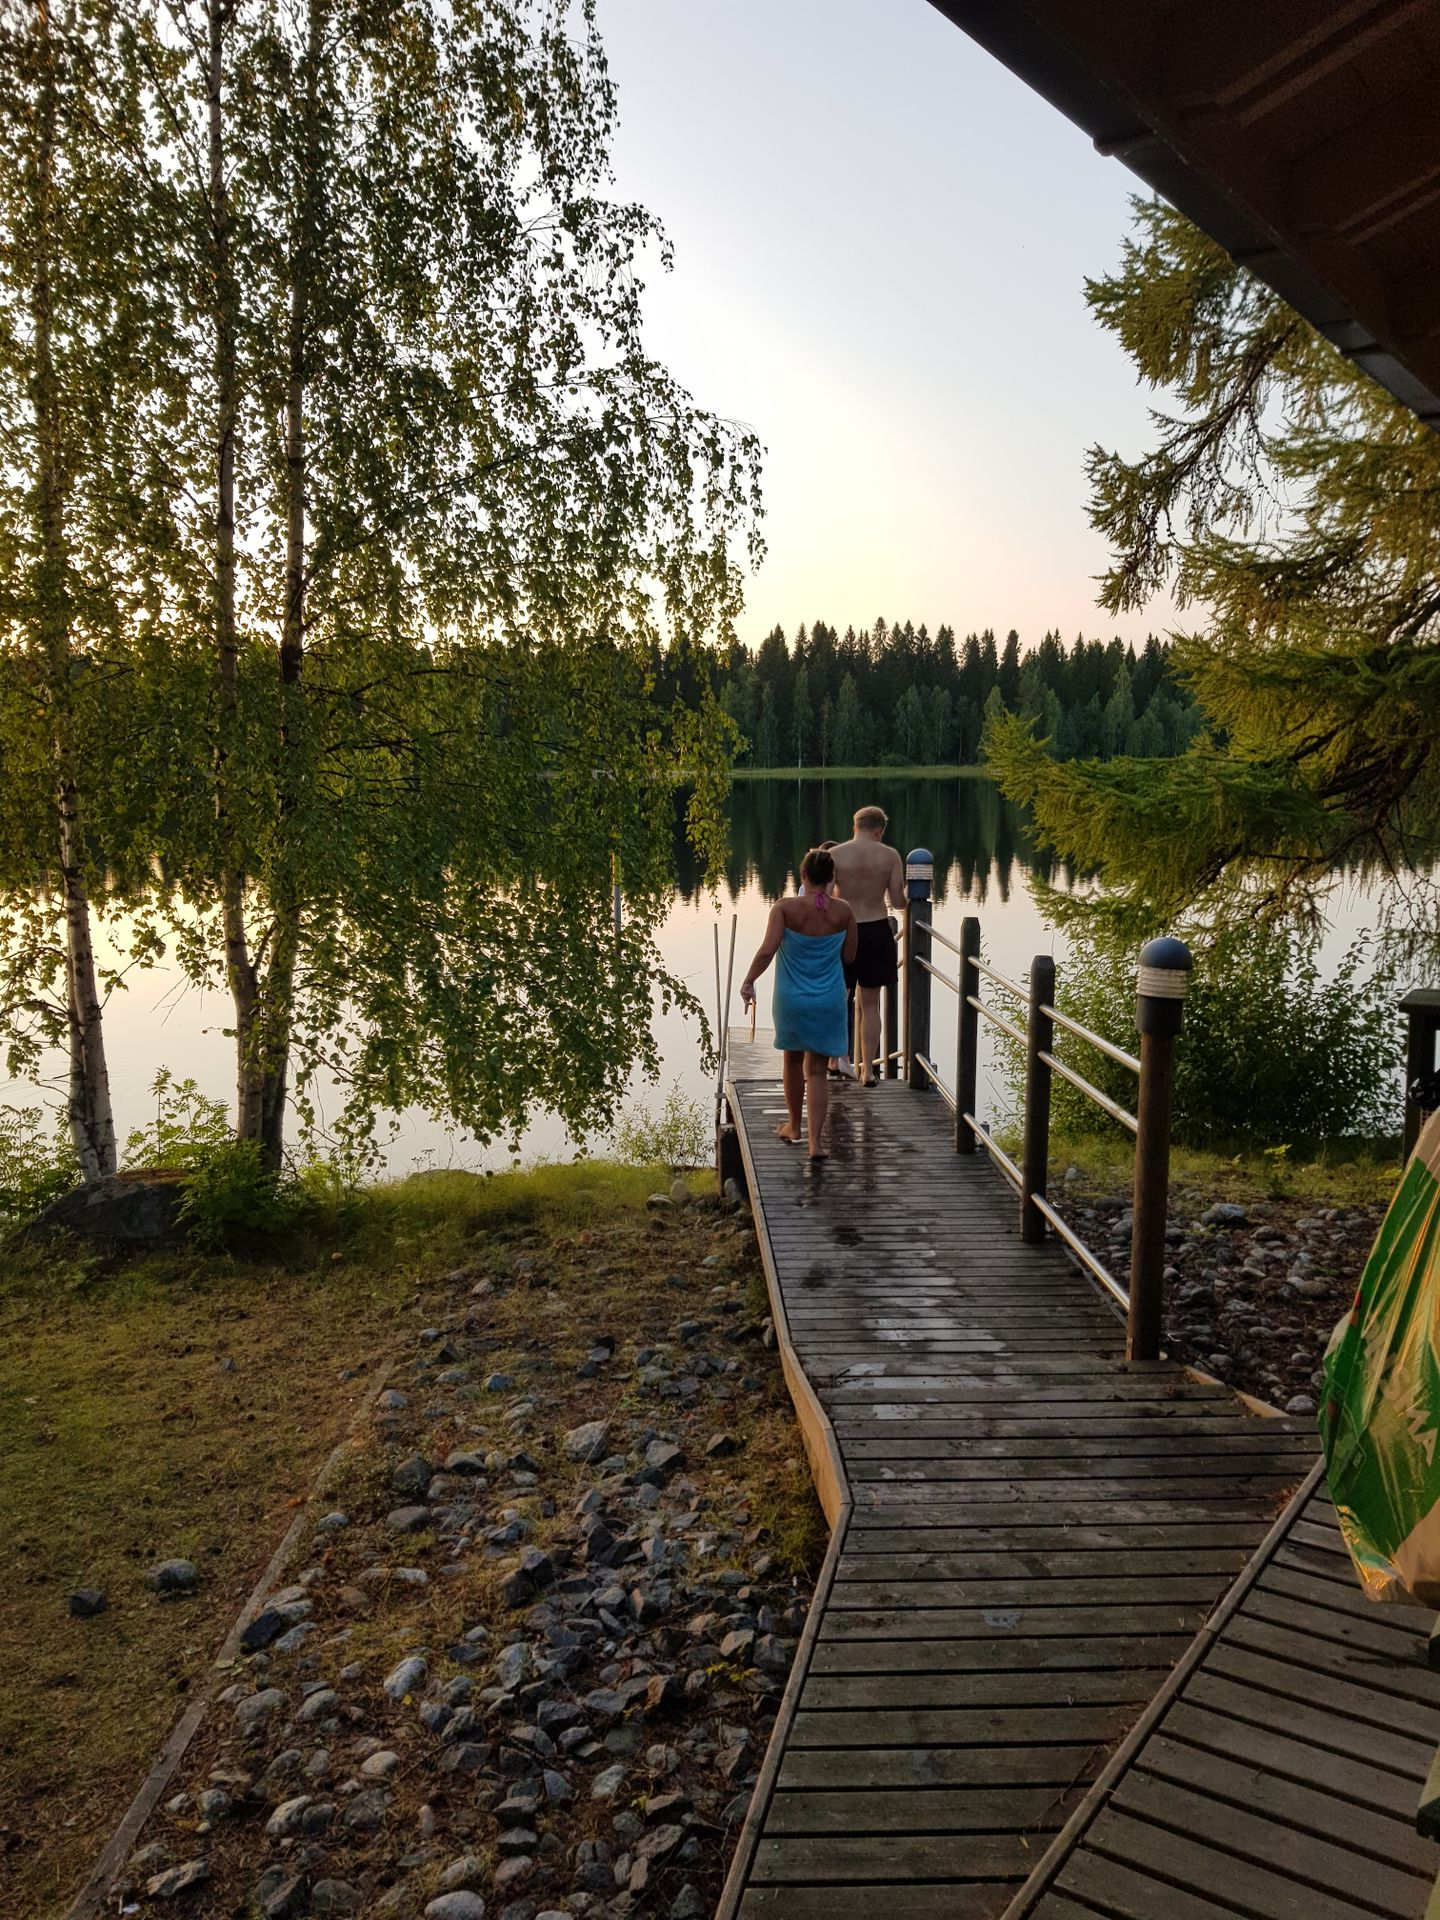 Das Erste Mal Finnische Sauna Vakantio